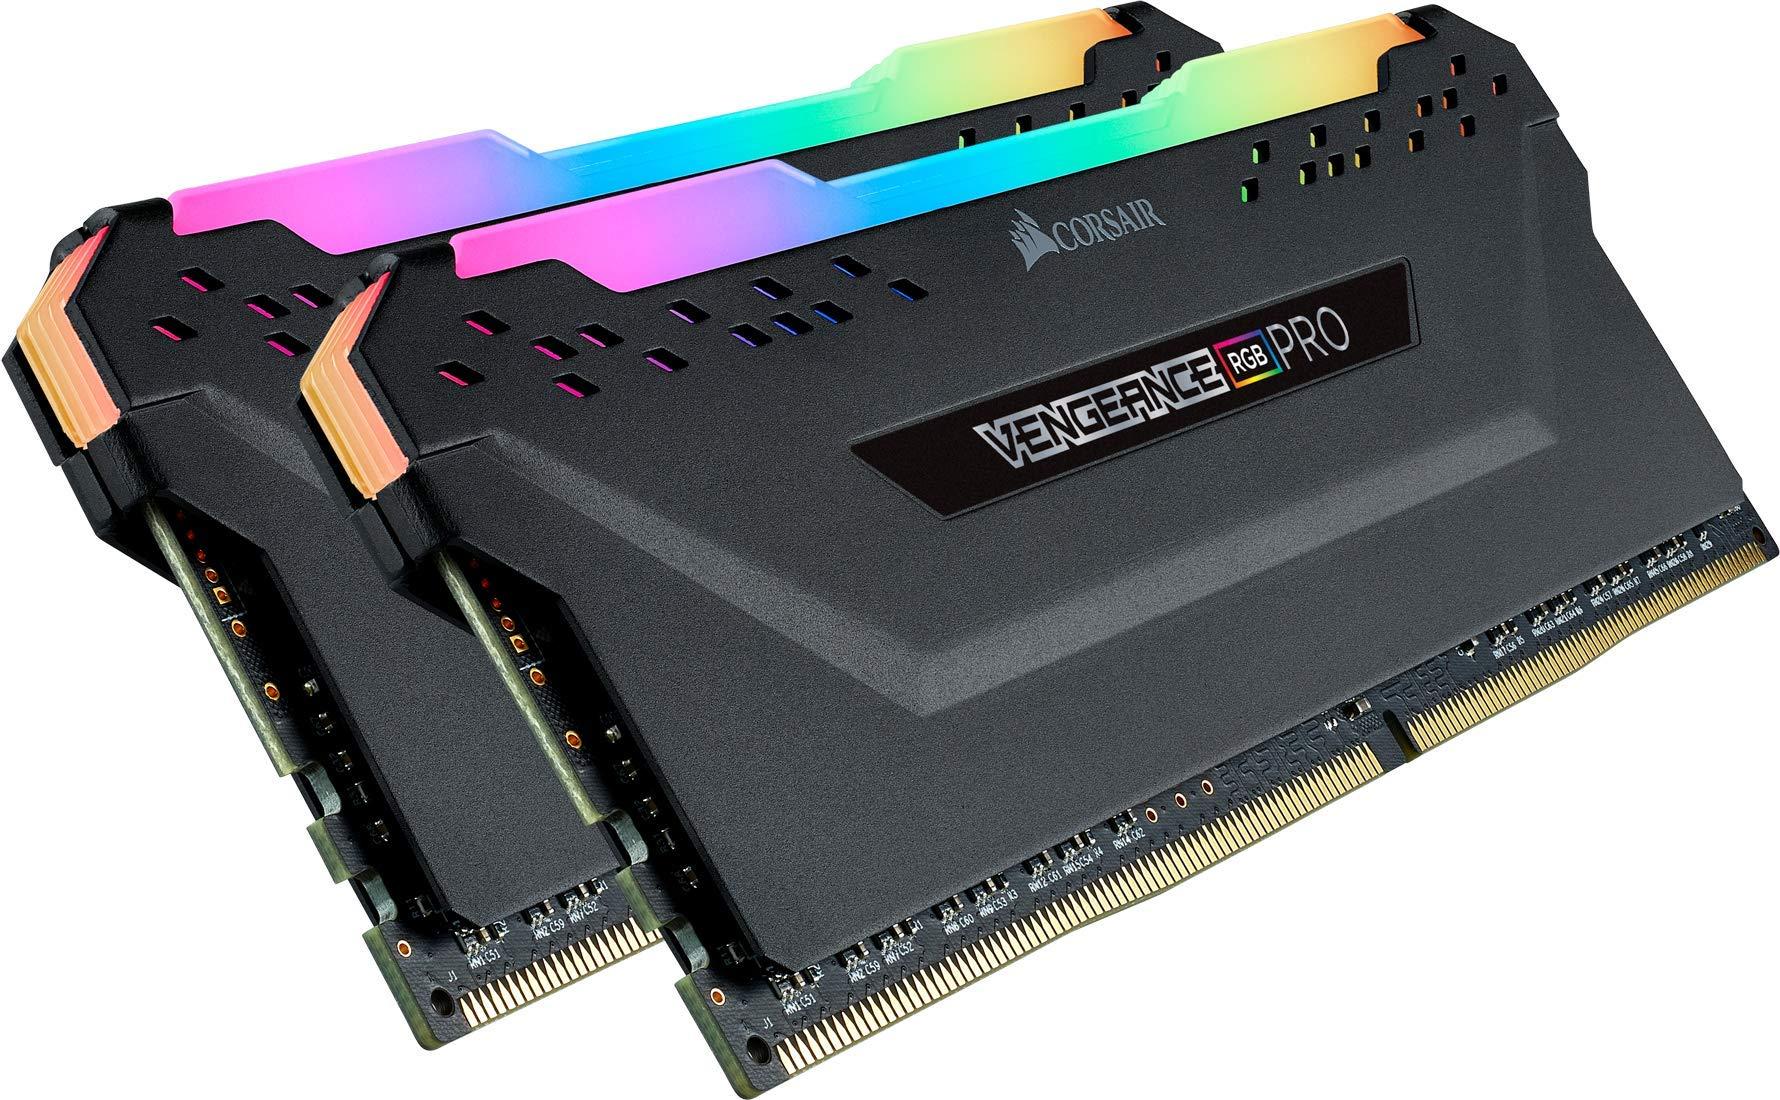 Corsair Vengeance RGB PRO 16 GB (2 x 8 GB) DDR4 3200 MHz C16 XMP 2.0 Enthusiast RGB LED Illuminated Memory Kit - Black